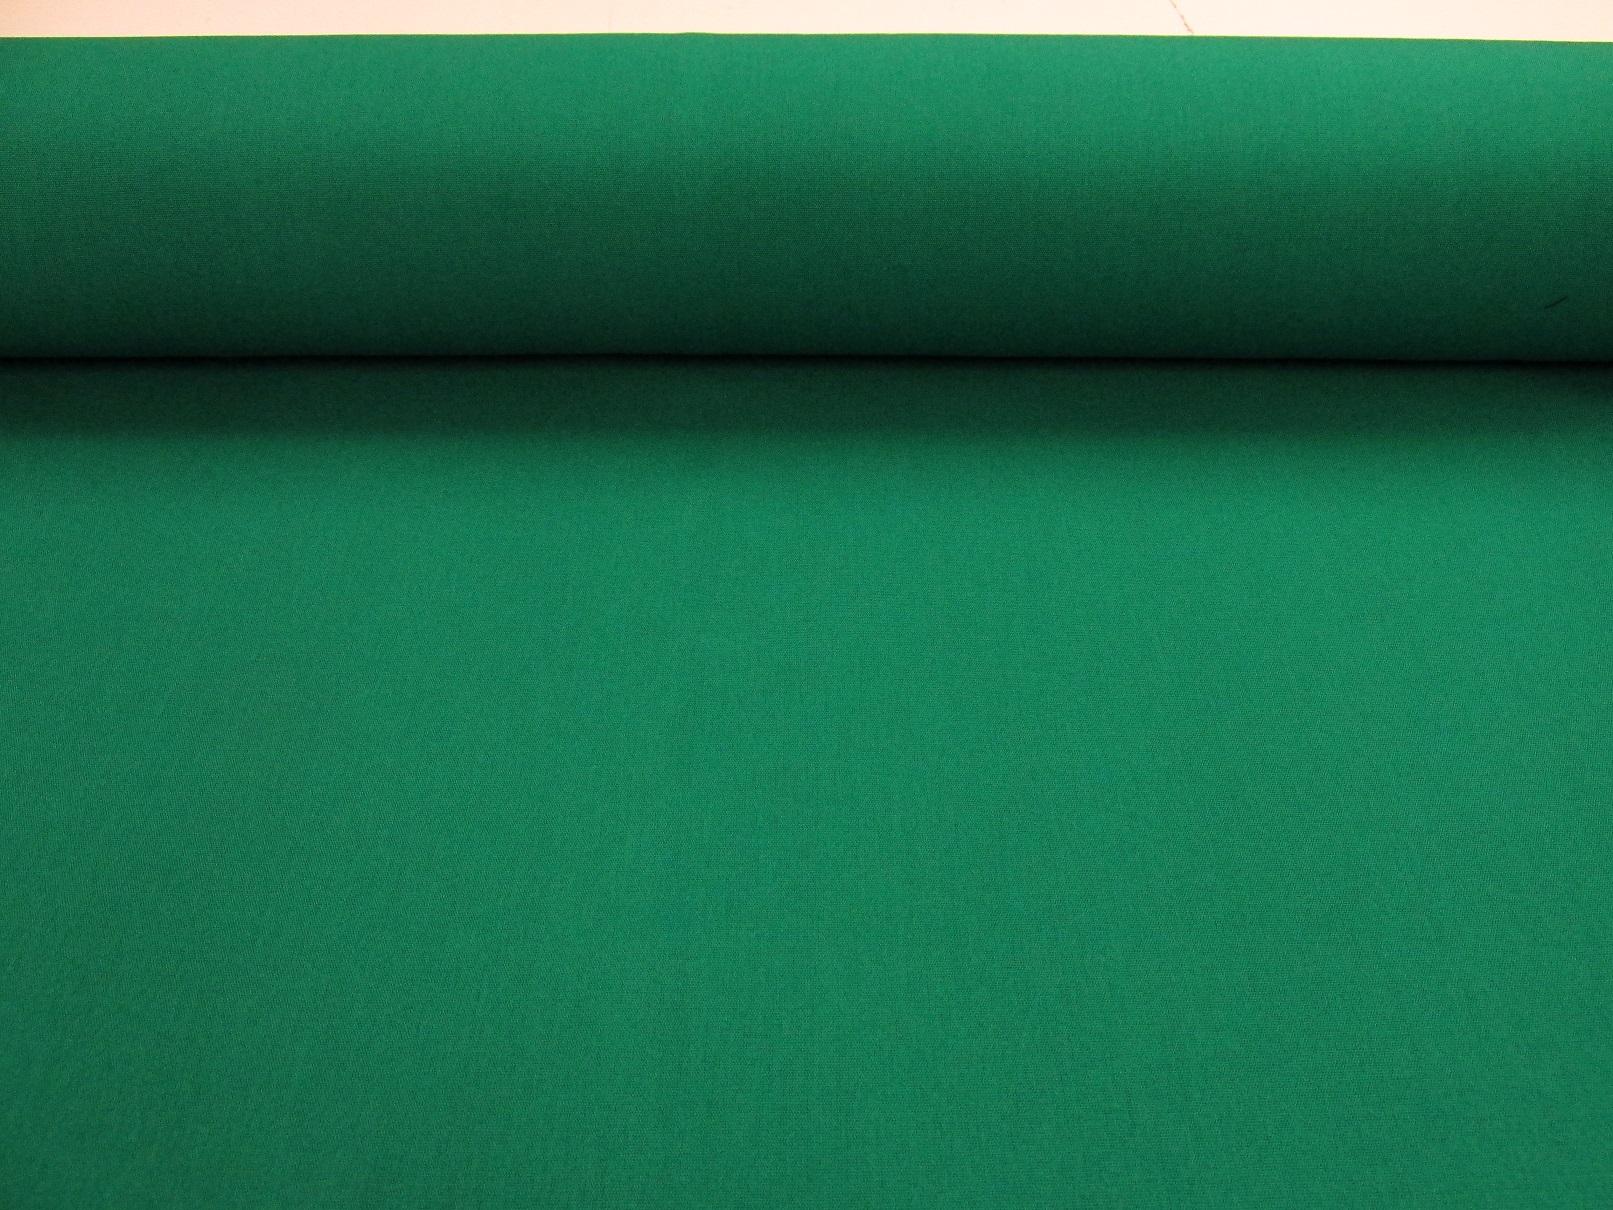 metraje tejido lona toldo acrilica x metros ancho de